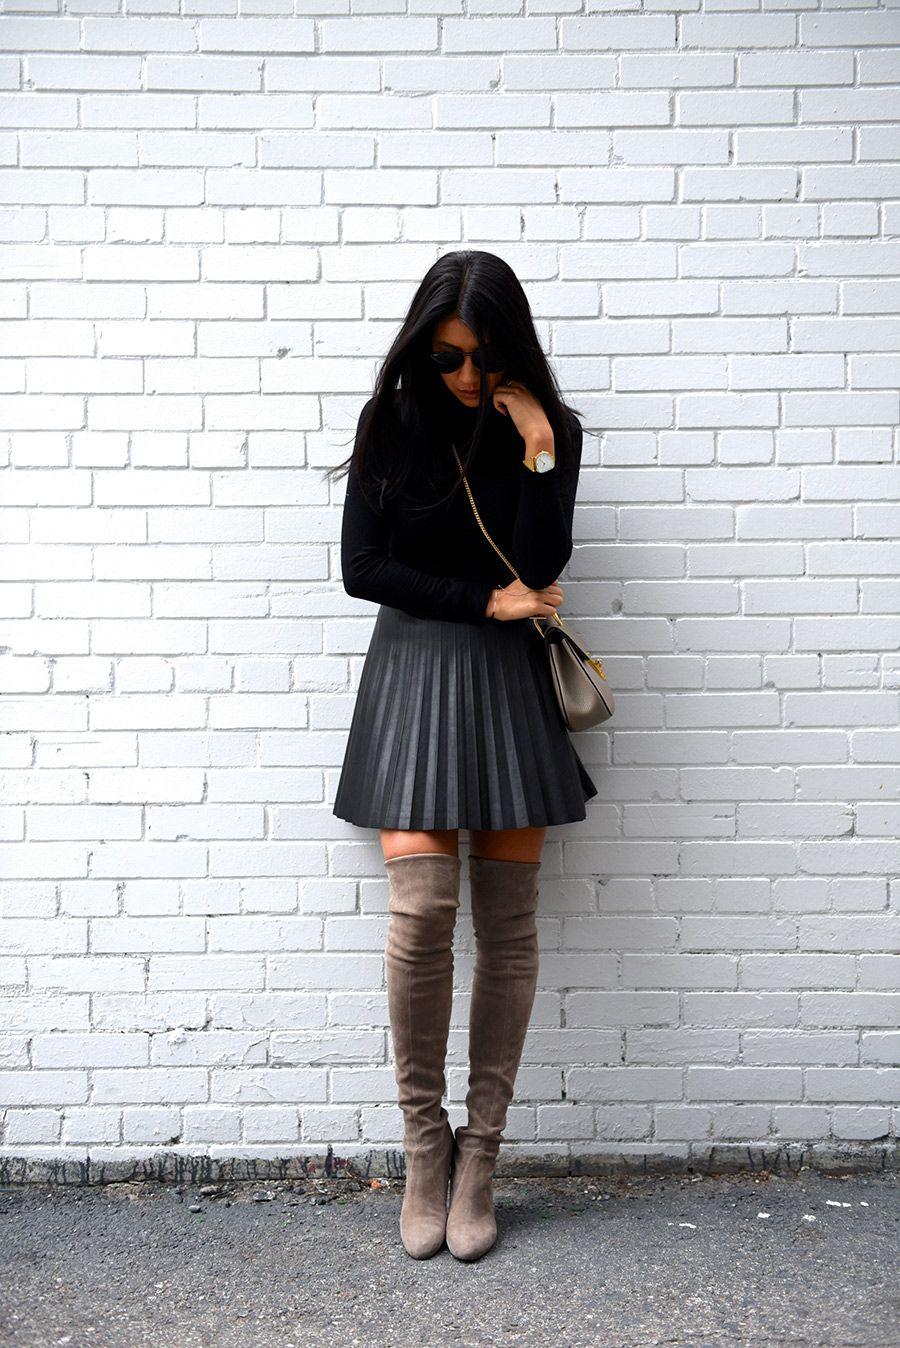 8432e5c29a77 Black Pleated Skirt, Black Leather Skirts, Pleated Skirt Outfit, Pleated  Leather Skirt,